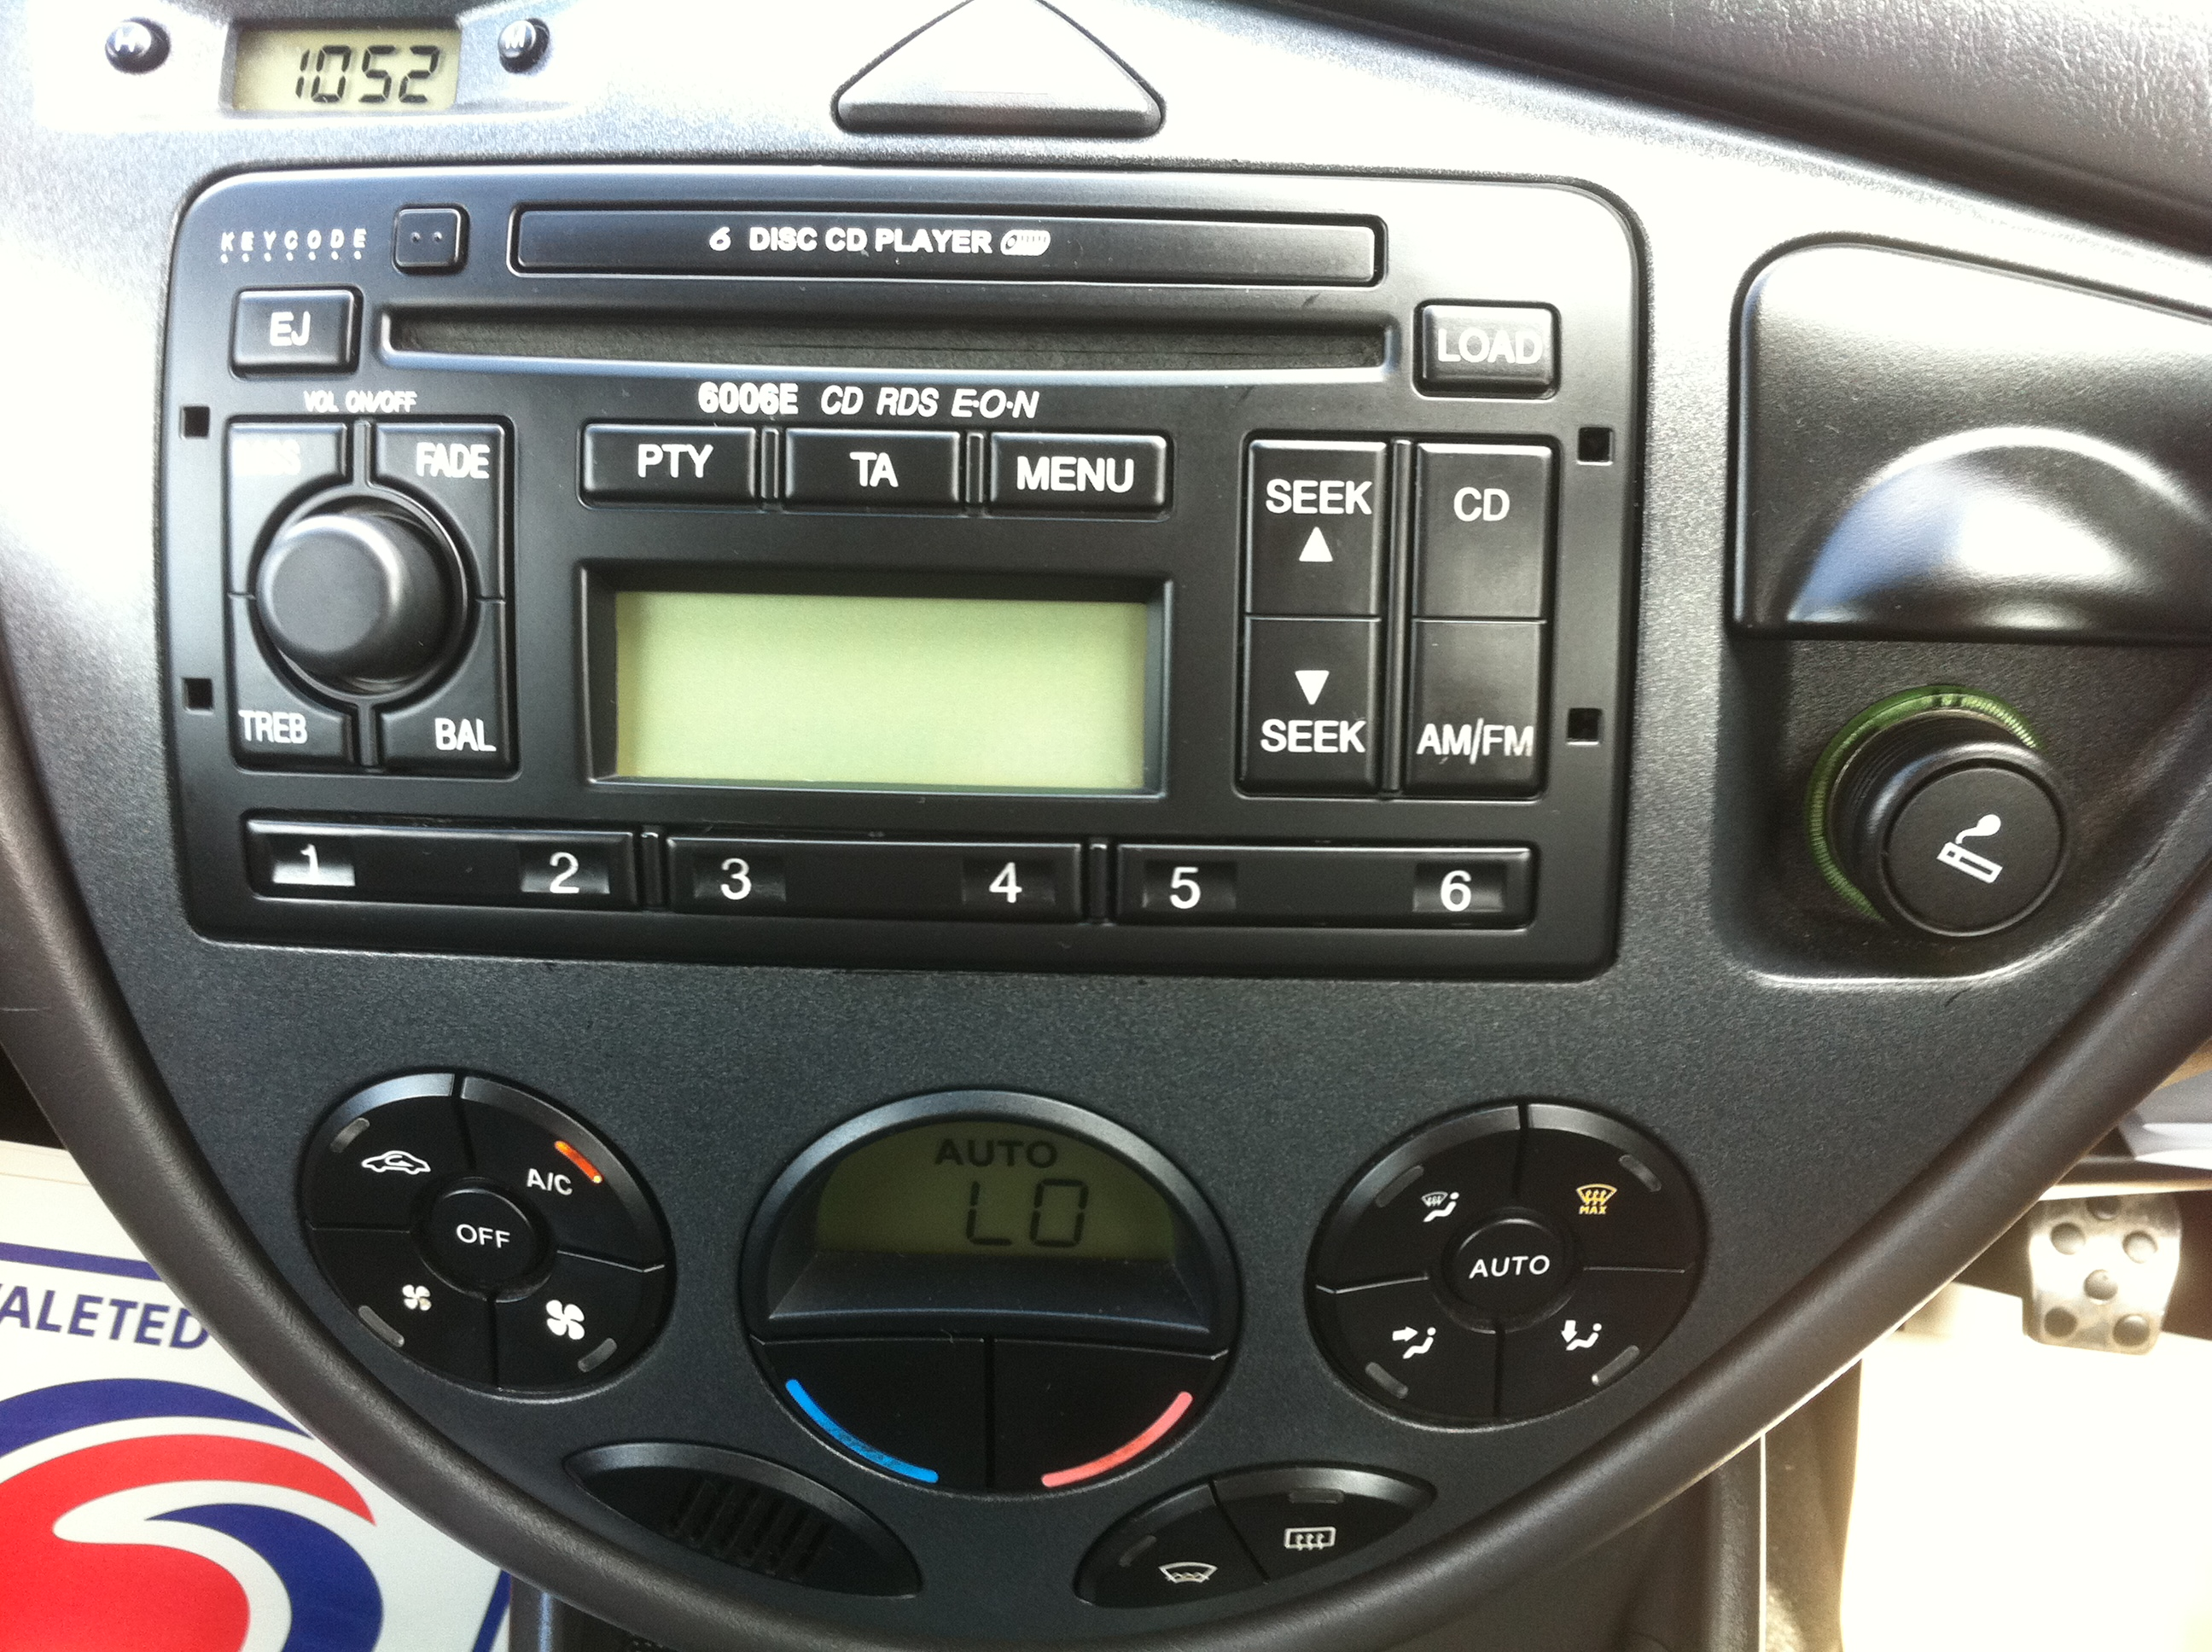 ba xr6 stereo wiring diagram cb radio antenna ford 6006 rds eon manual